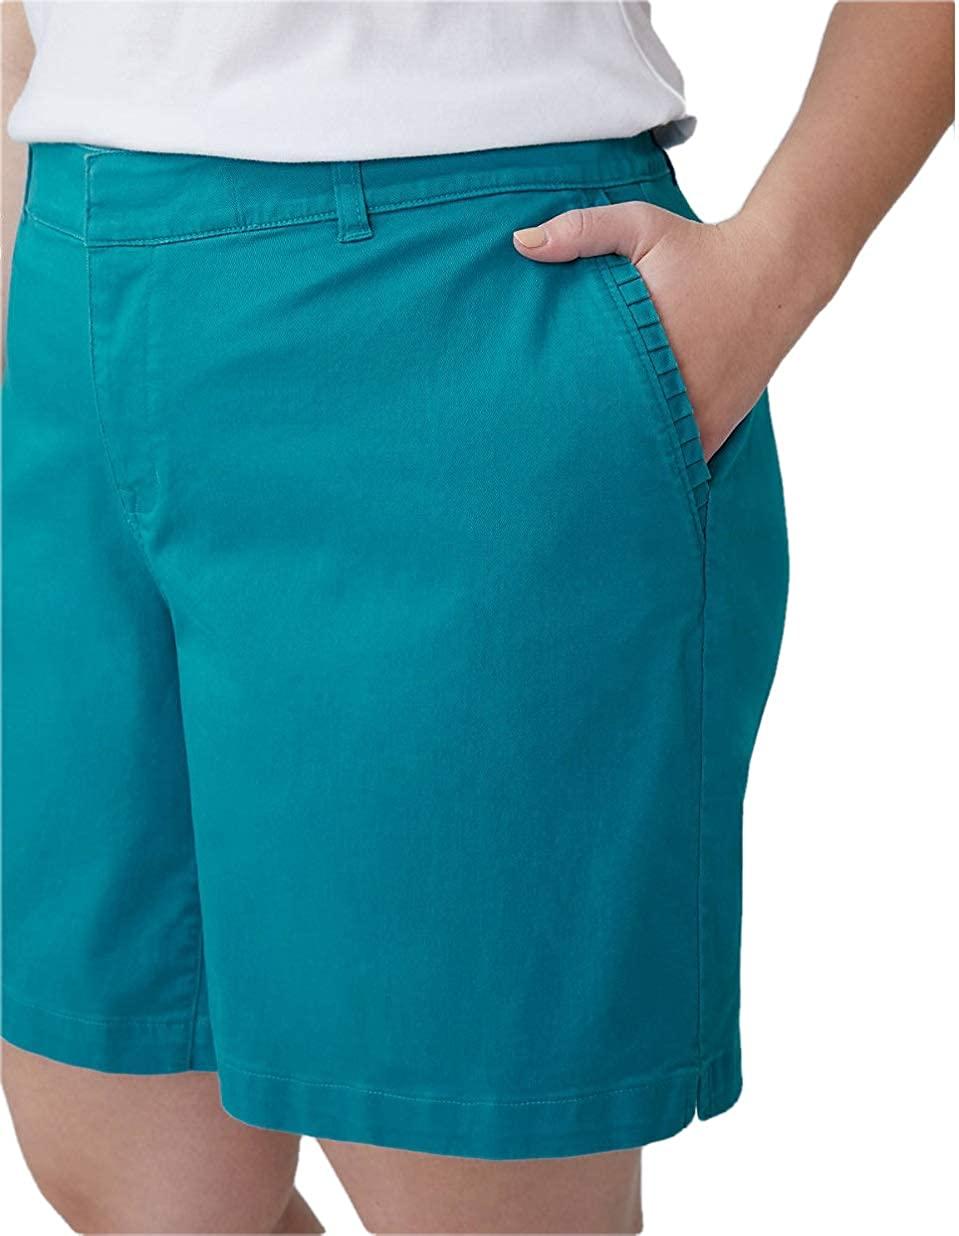 Lane Bryant Tahitian Tide Girlfriend Shorts (16) Green